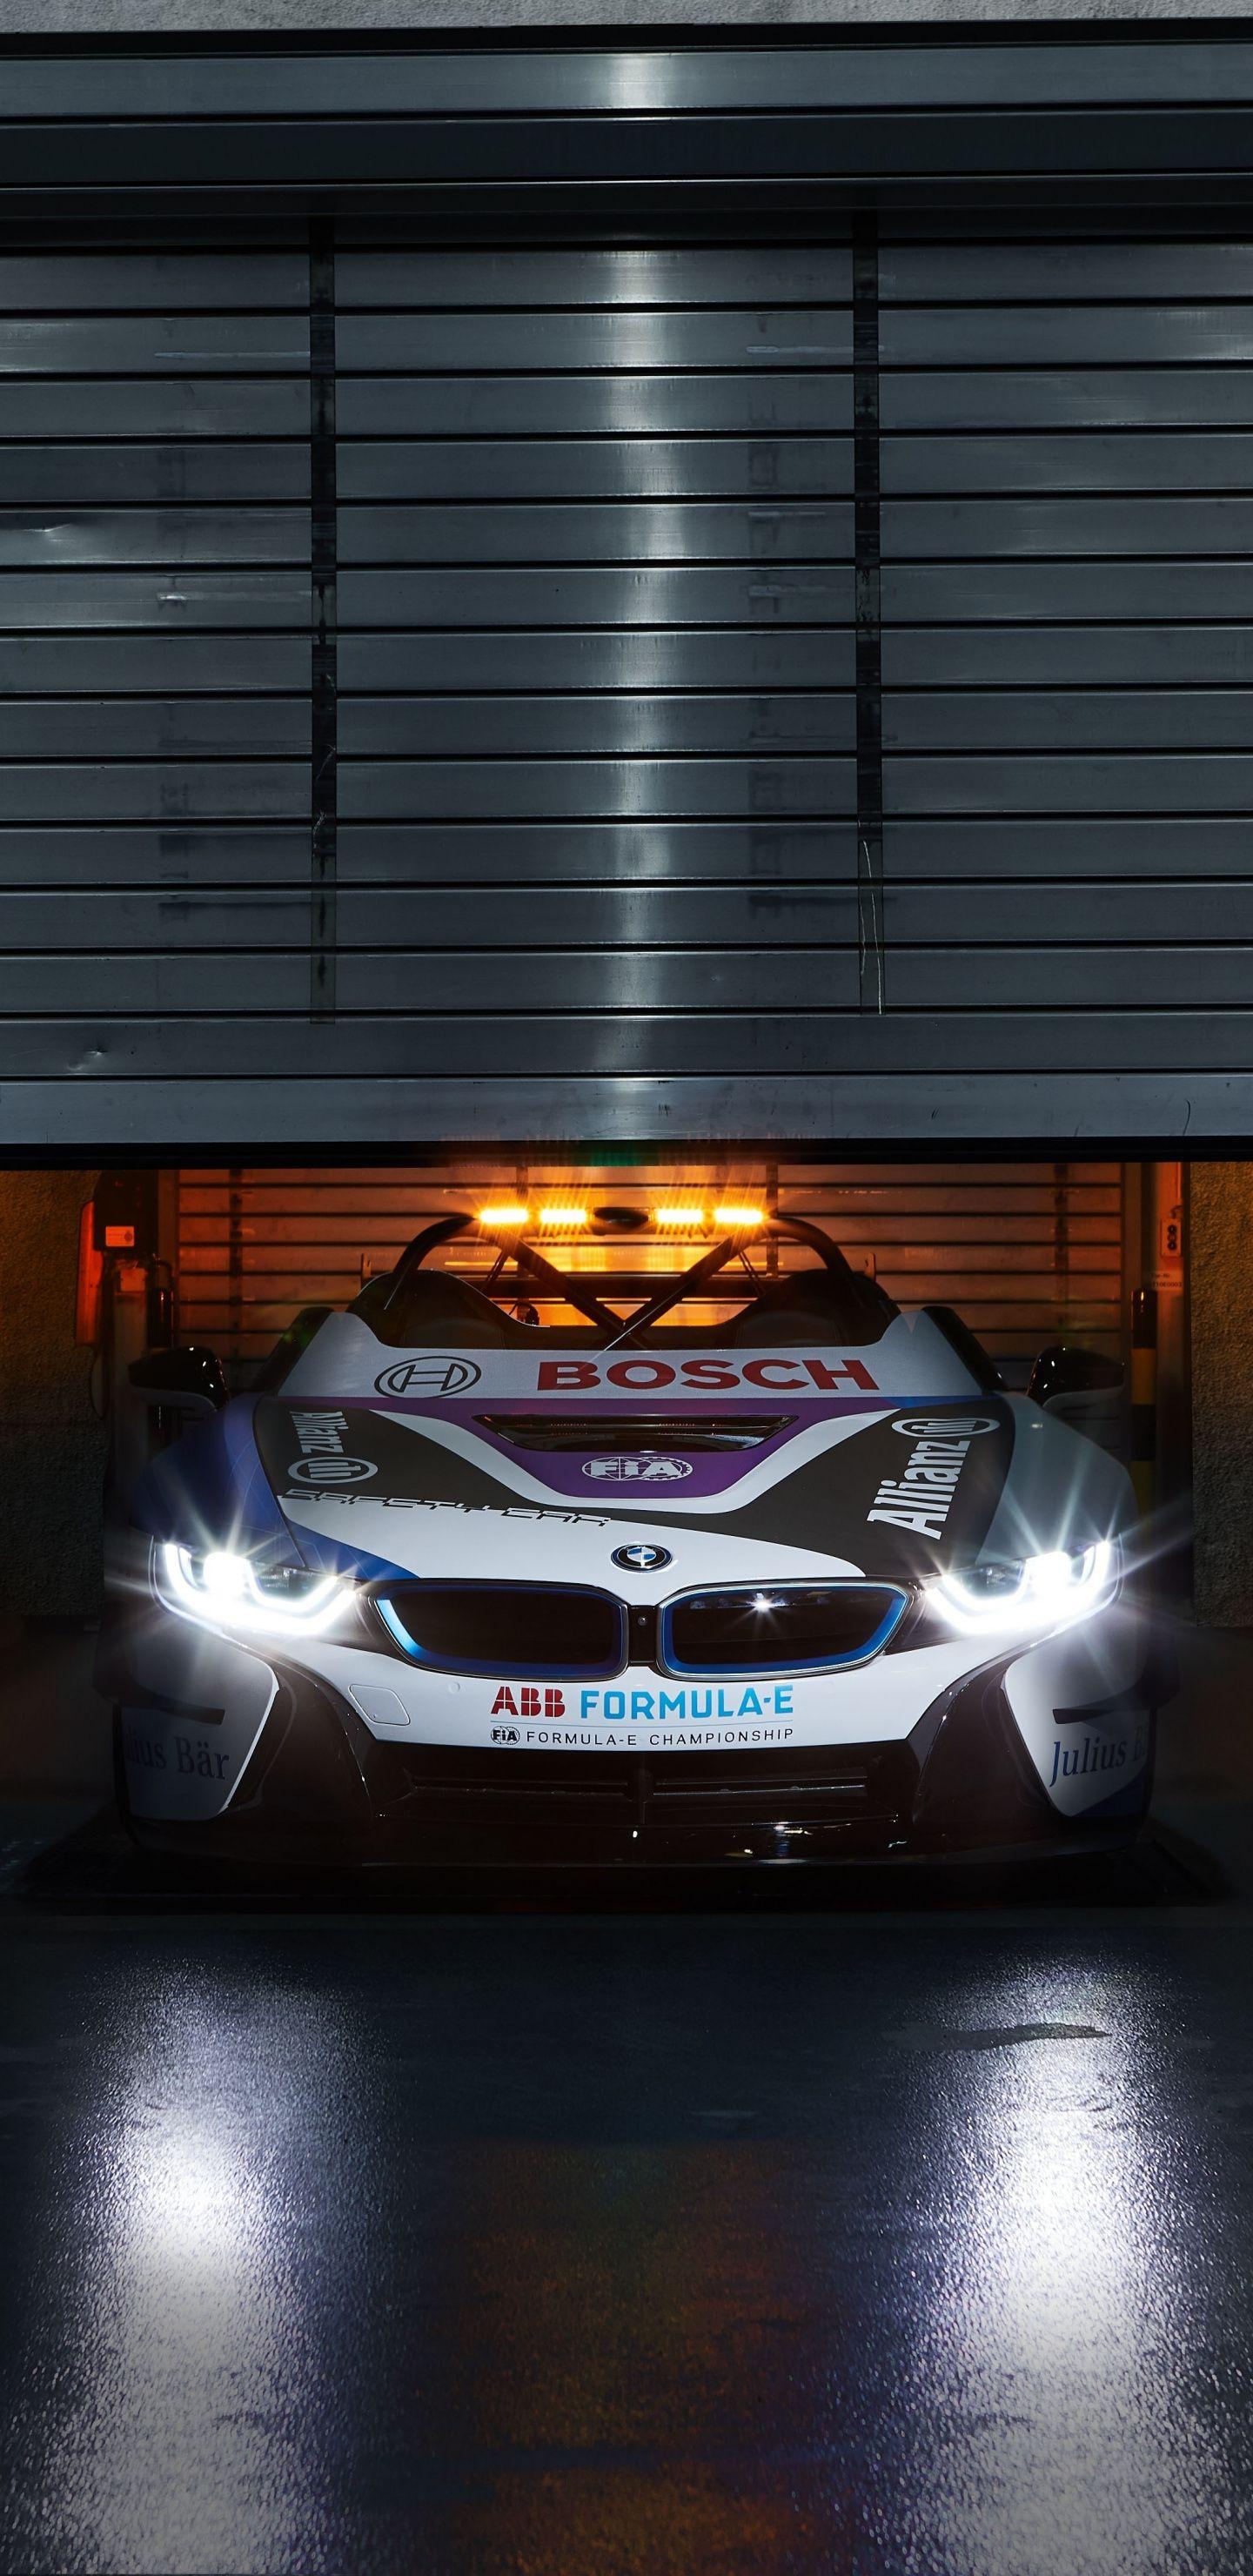 1440x2960 Bmw I8 Roadster Formula E Safety Car Wallpaper Car